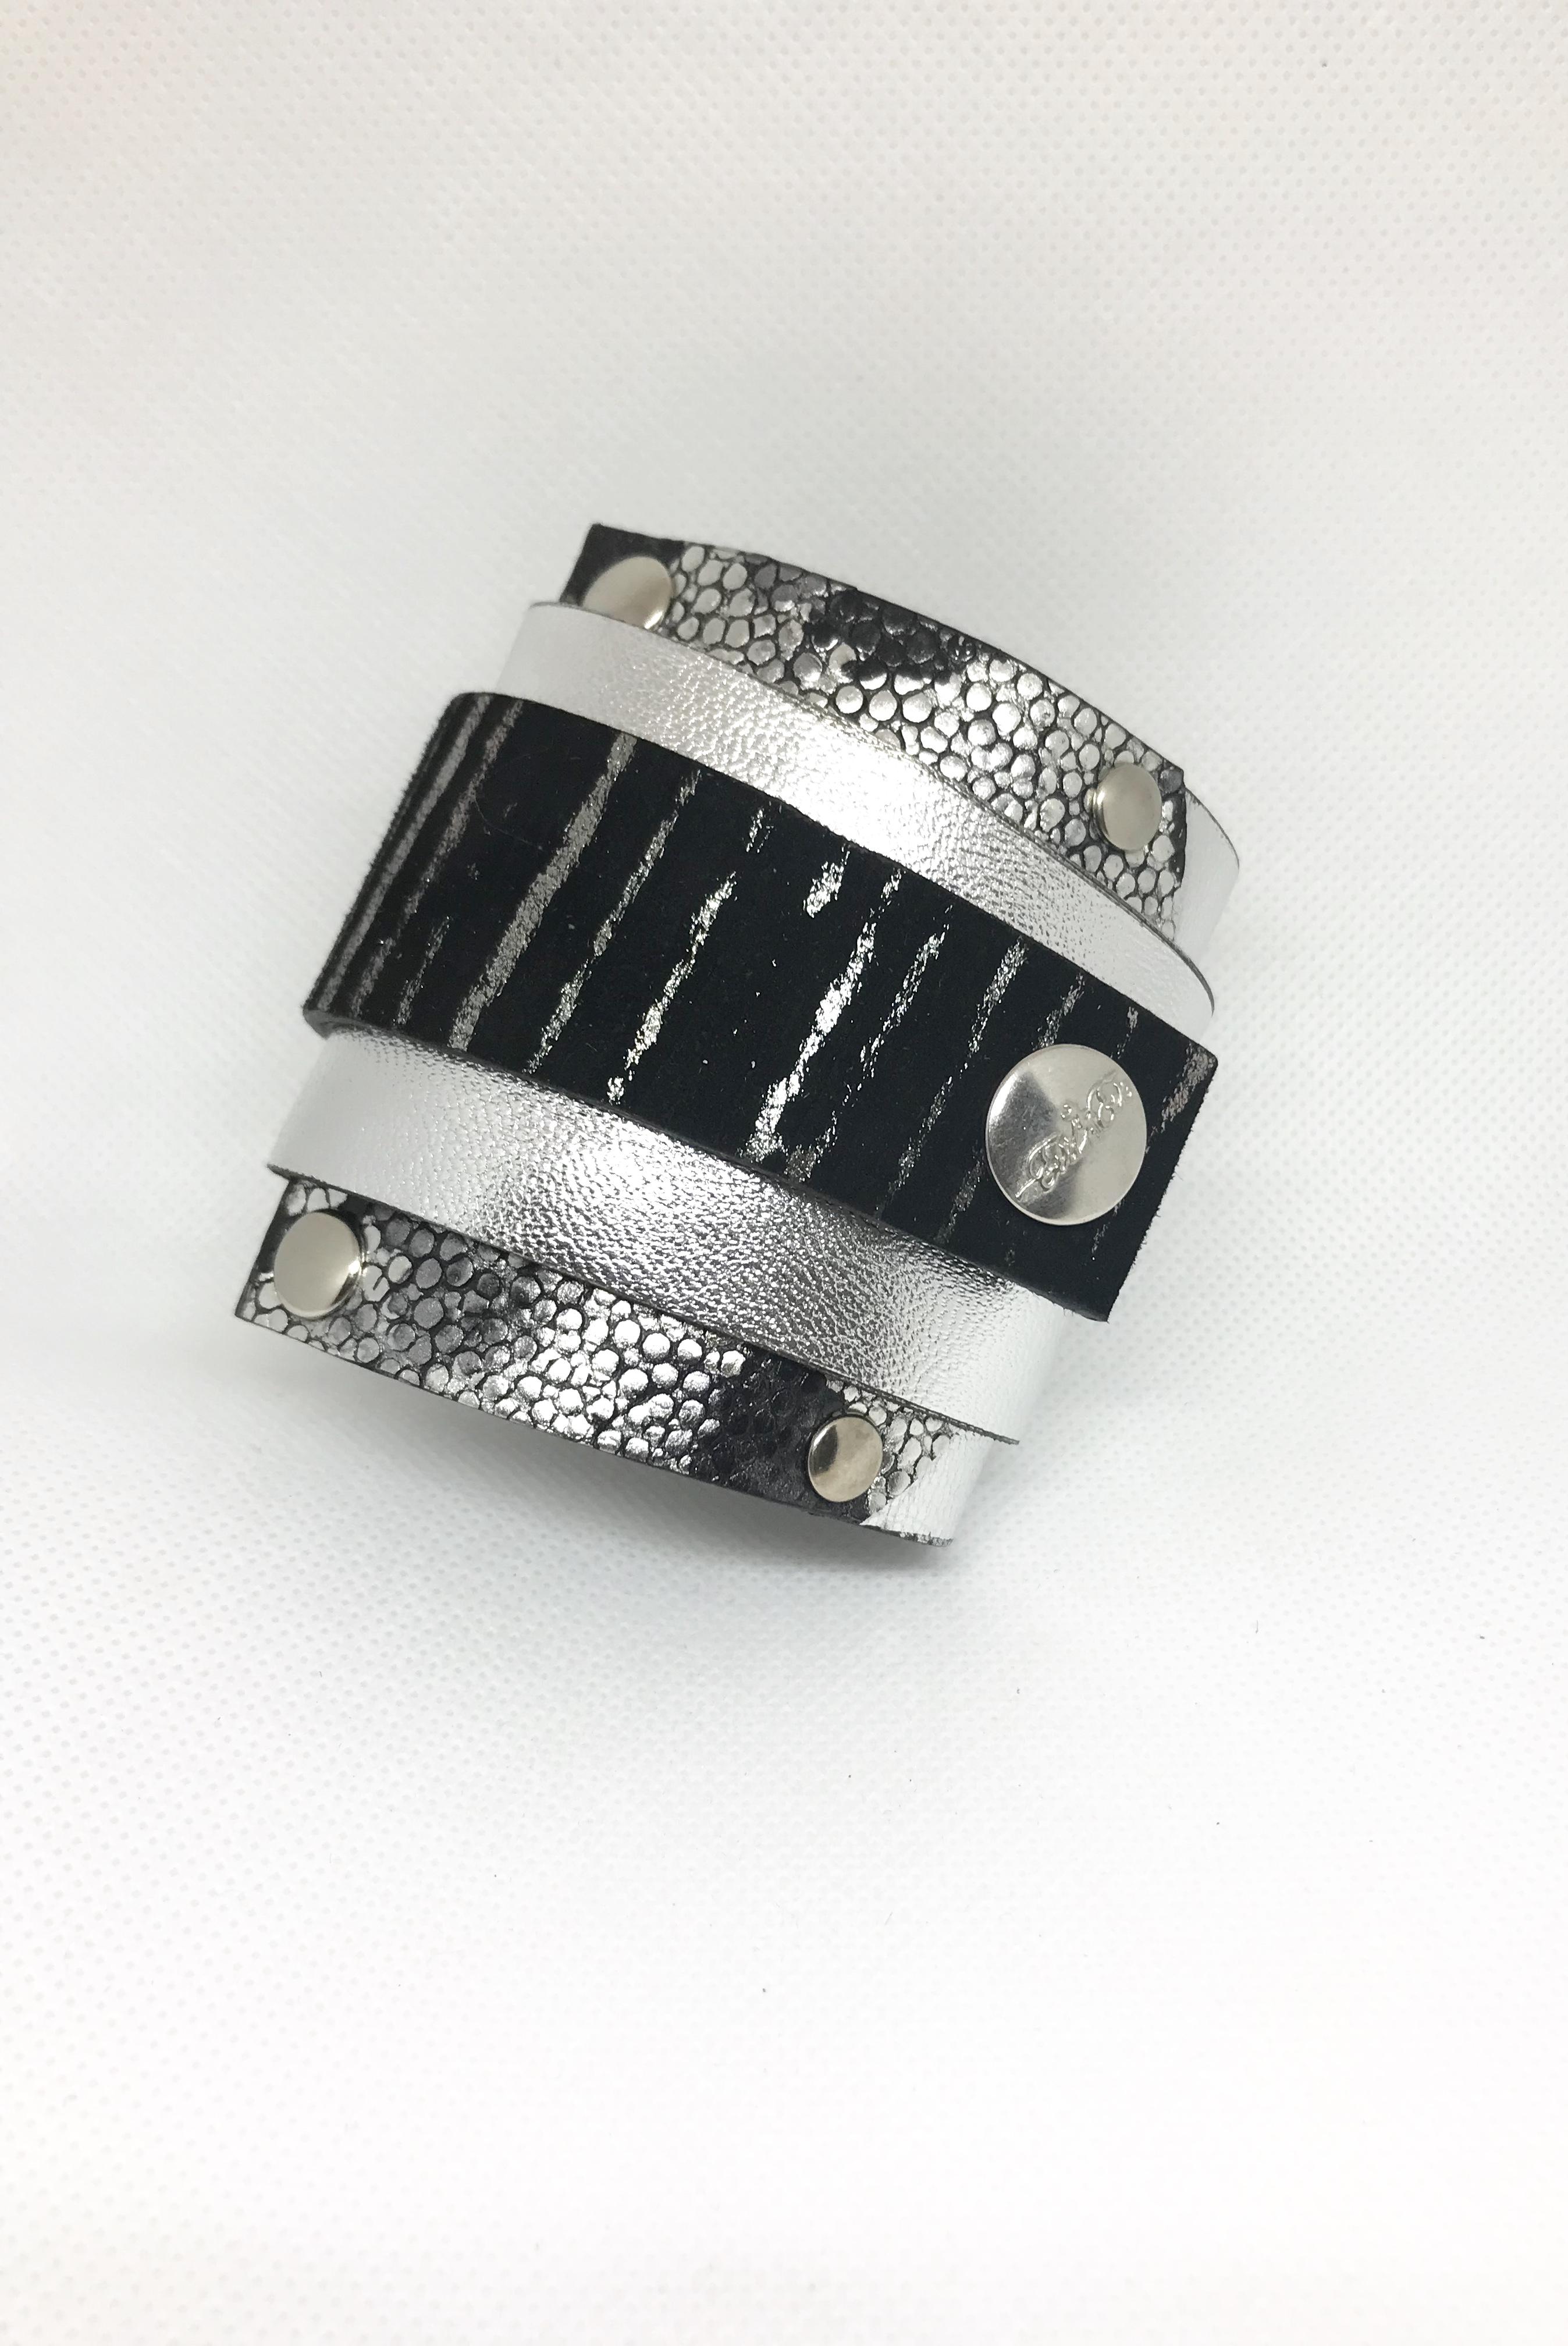 unique leather bracelet silverlove edgy wrap around cuff evileve